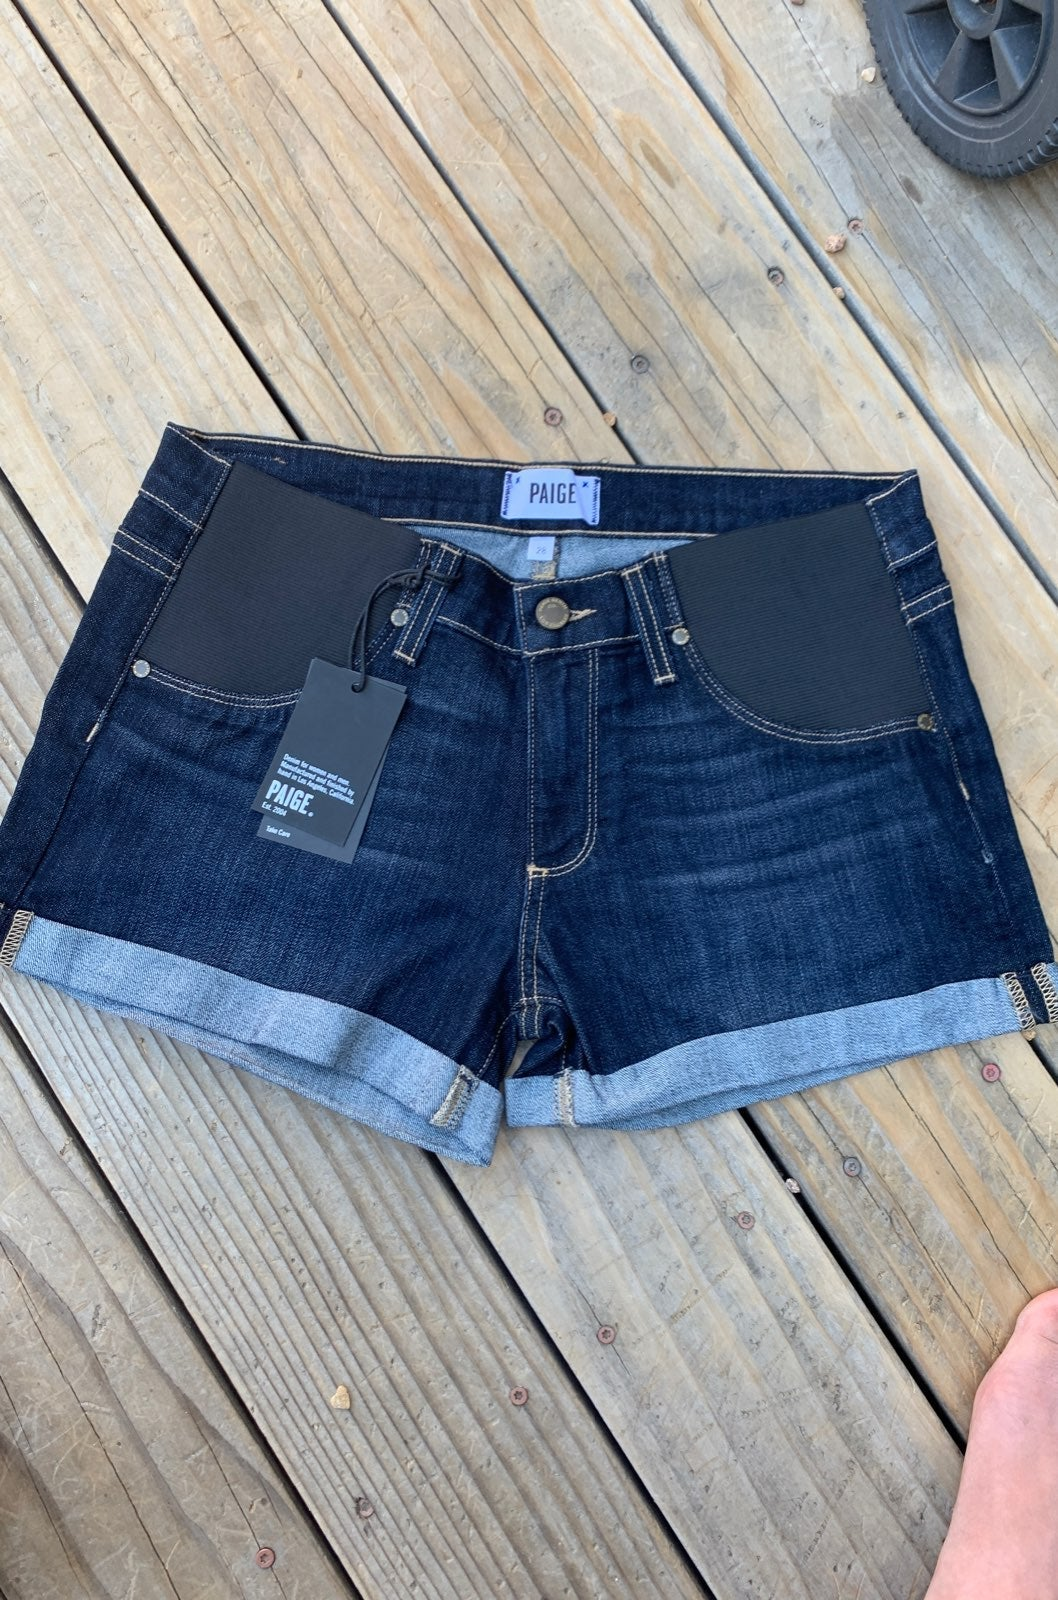 Paige maternity jean shorts